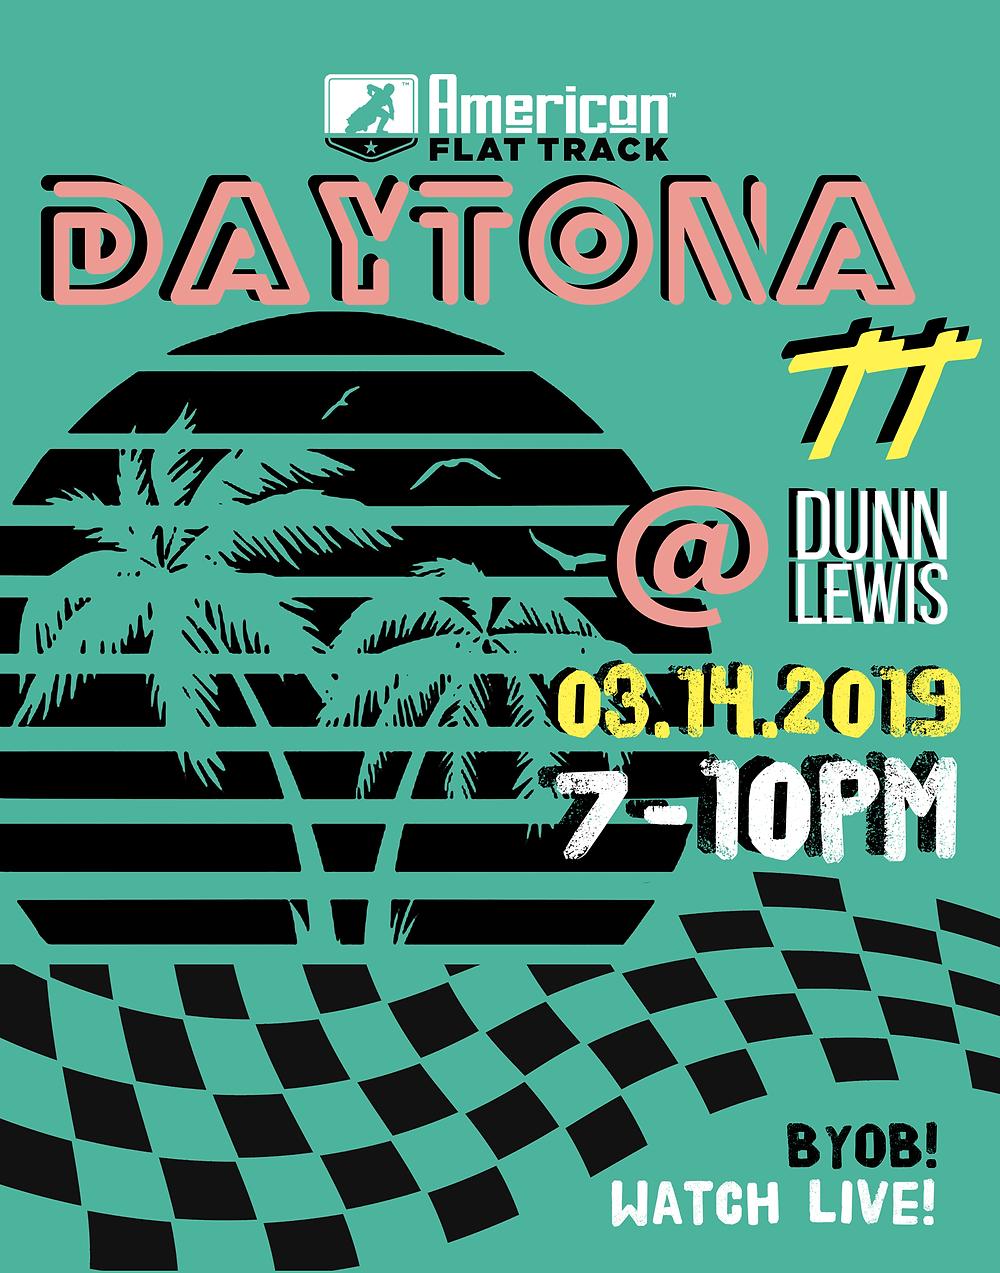 American Flat Track, Daytona TT, Washington DC, Motorcycle, DUNN LEWIS, Event, Motorcycle Race, Motorcycle Shop,